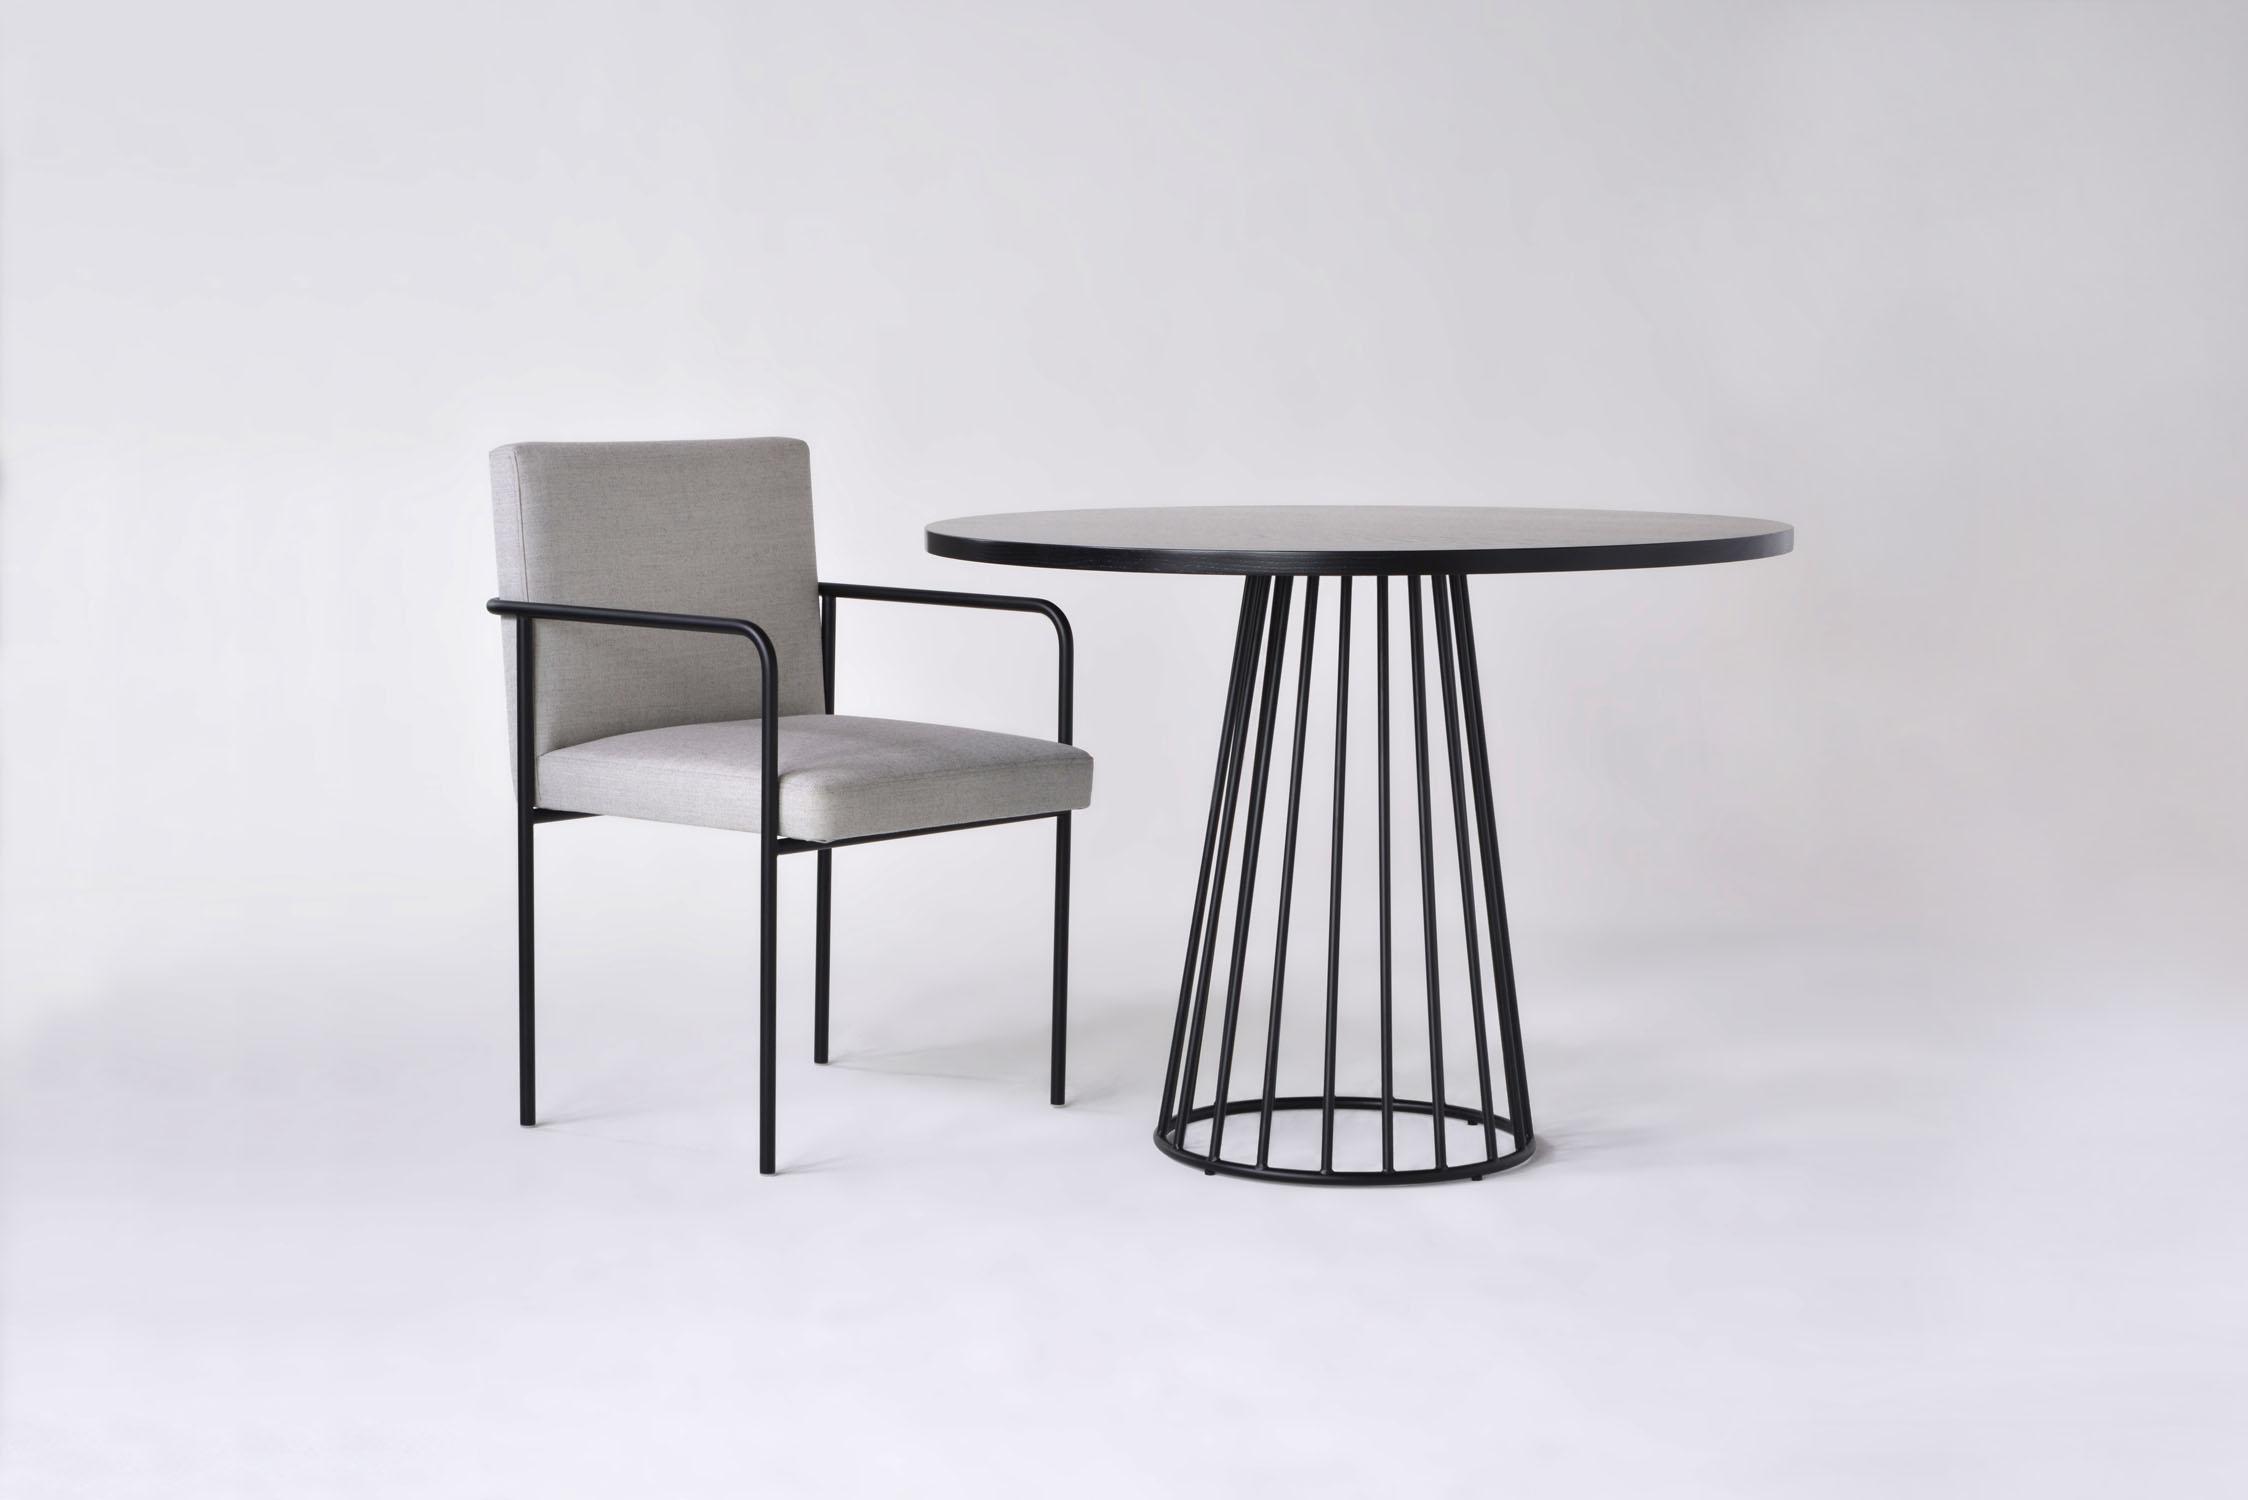 Phase Design Reza Feiz Designer Trolley Side Chair